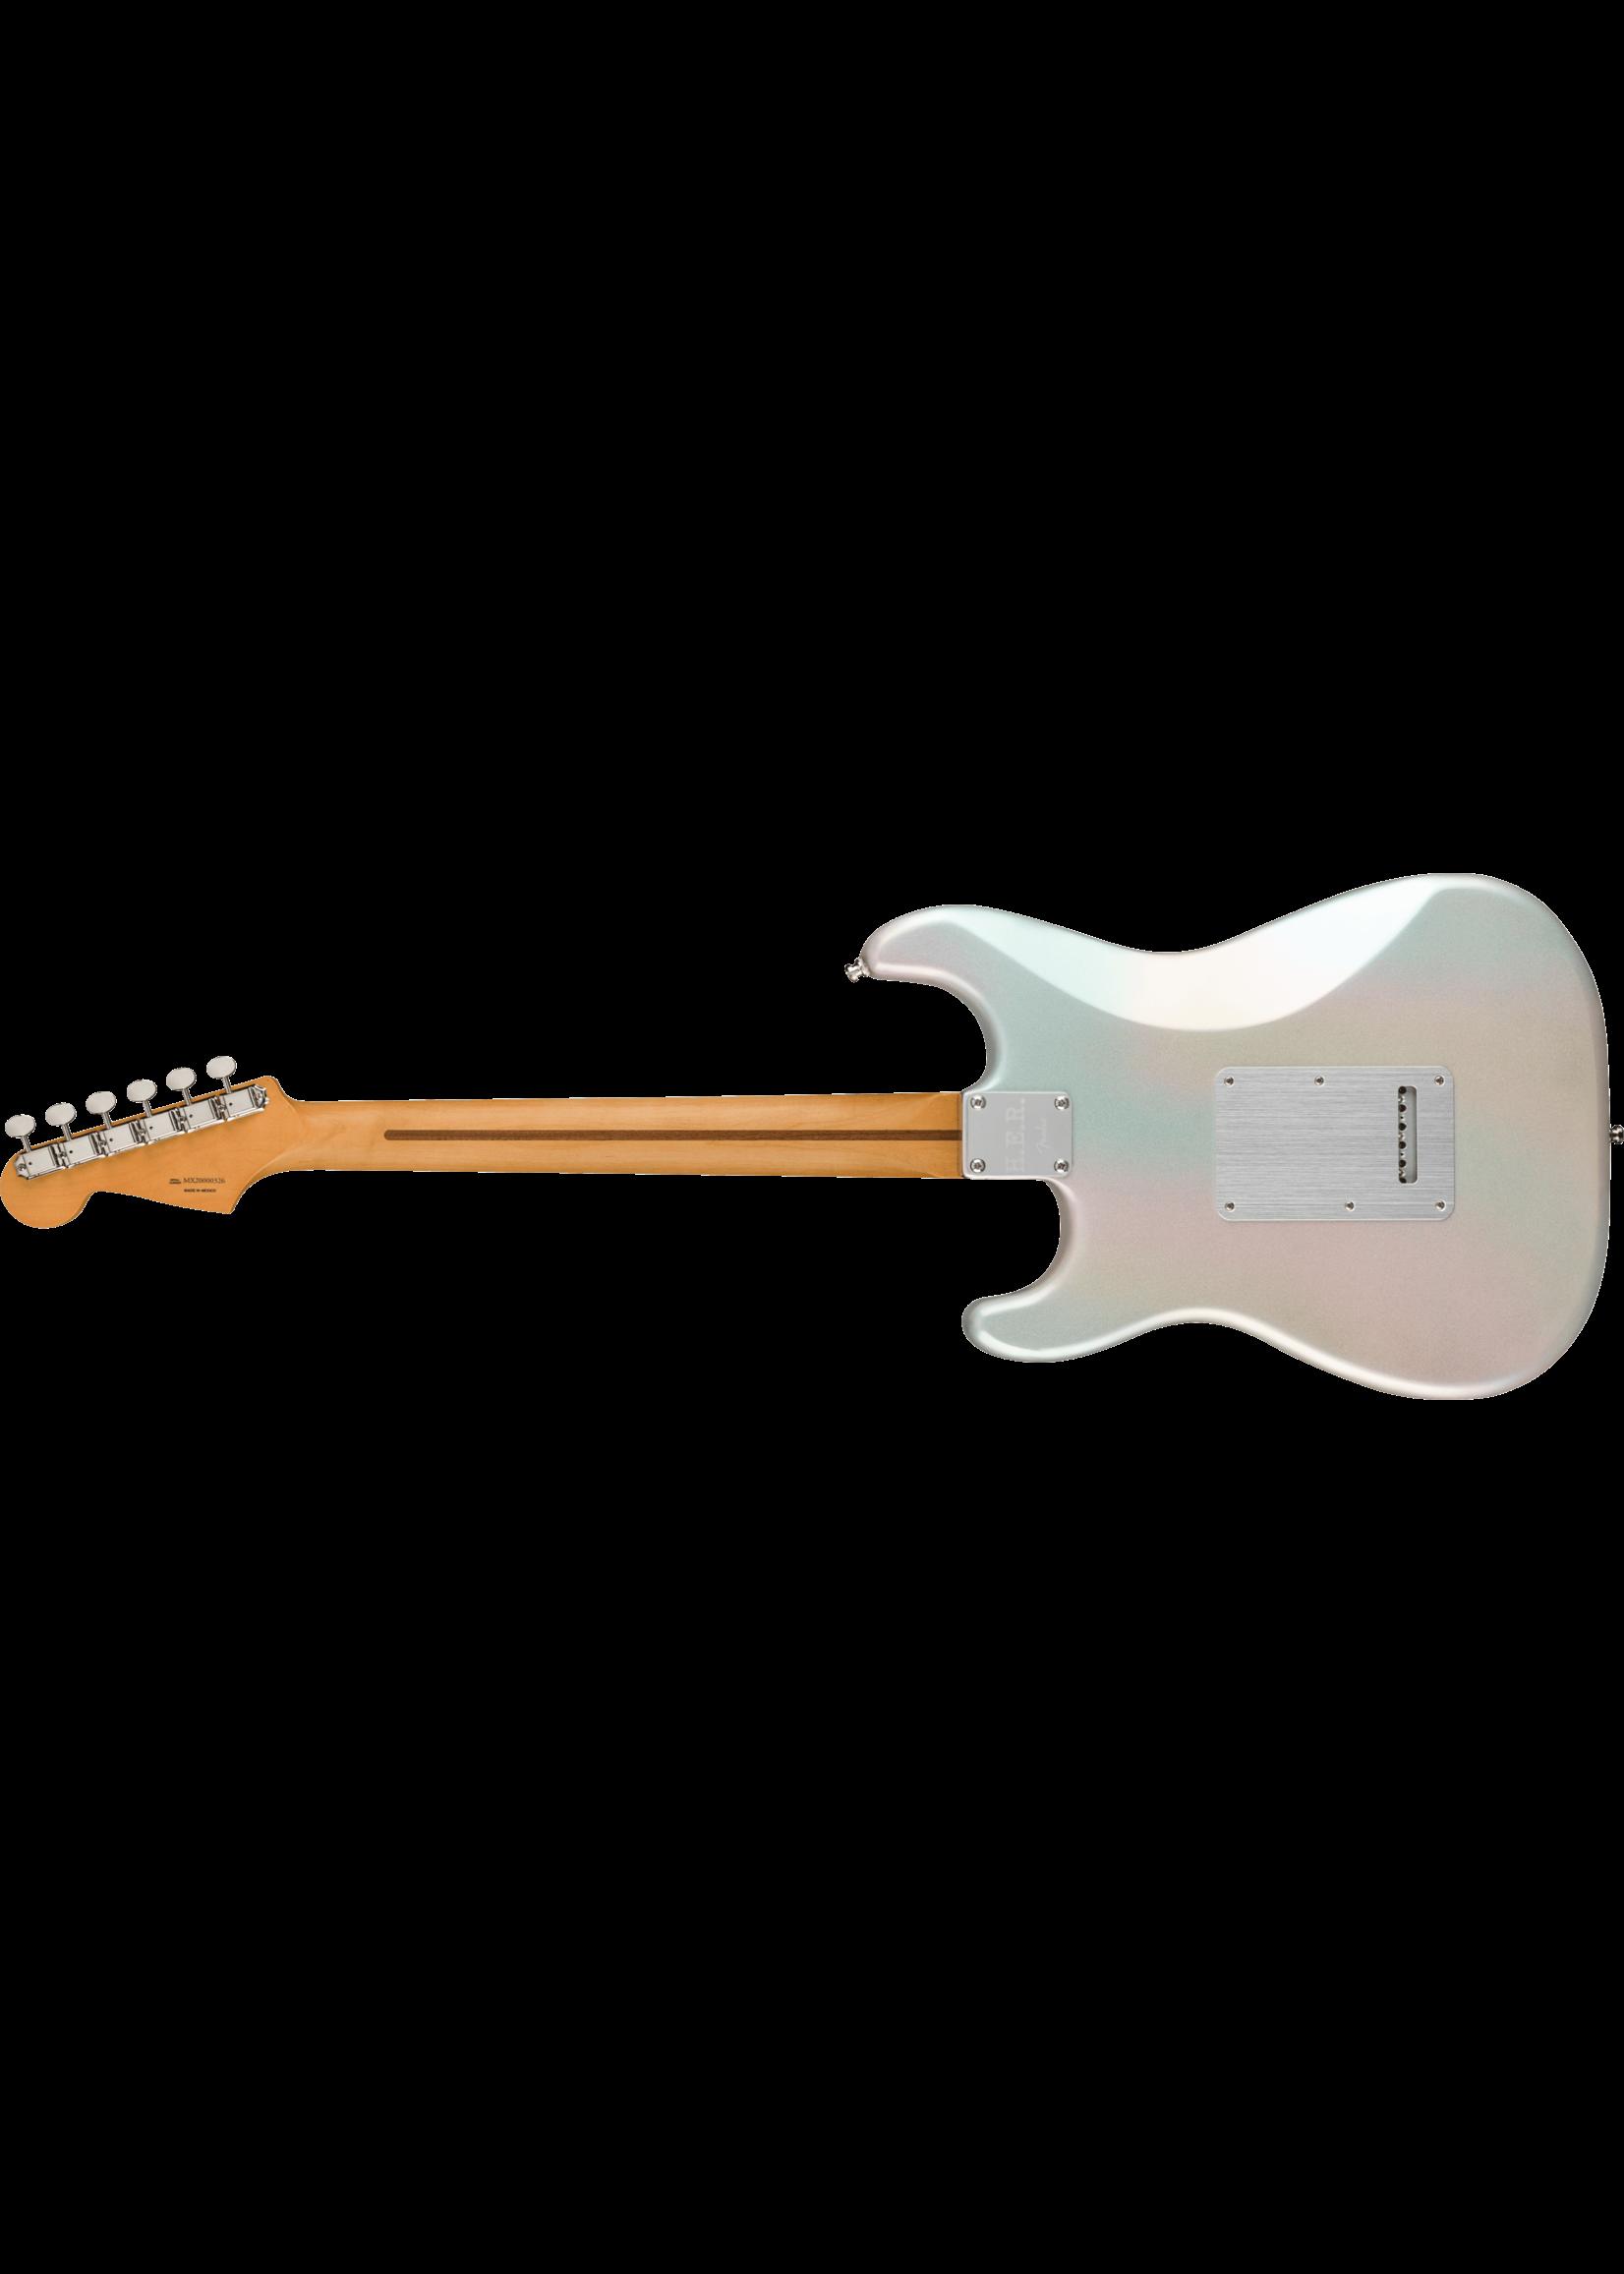 Fender Fender H.E.R. Signature Stratocaster Chrome Glow